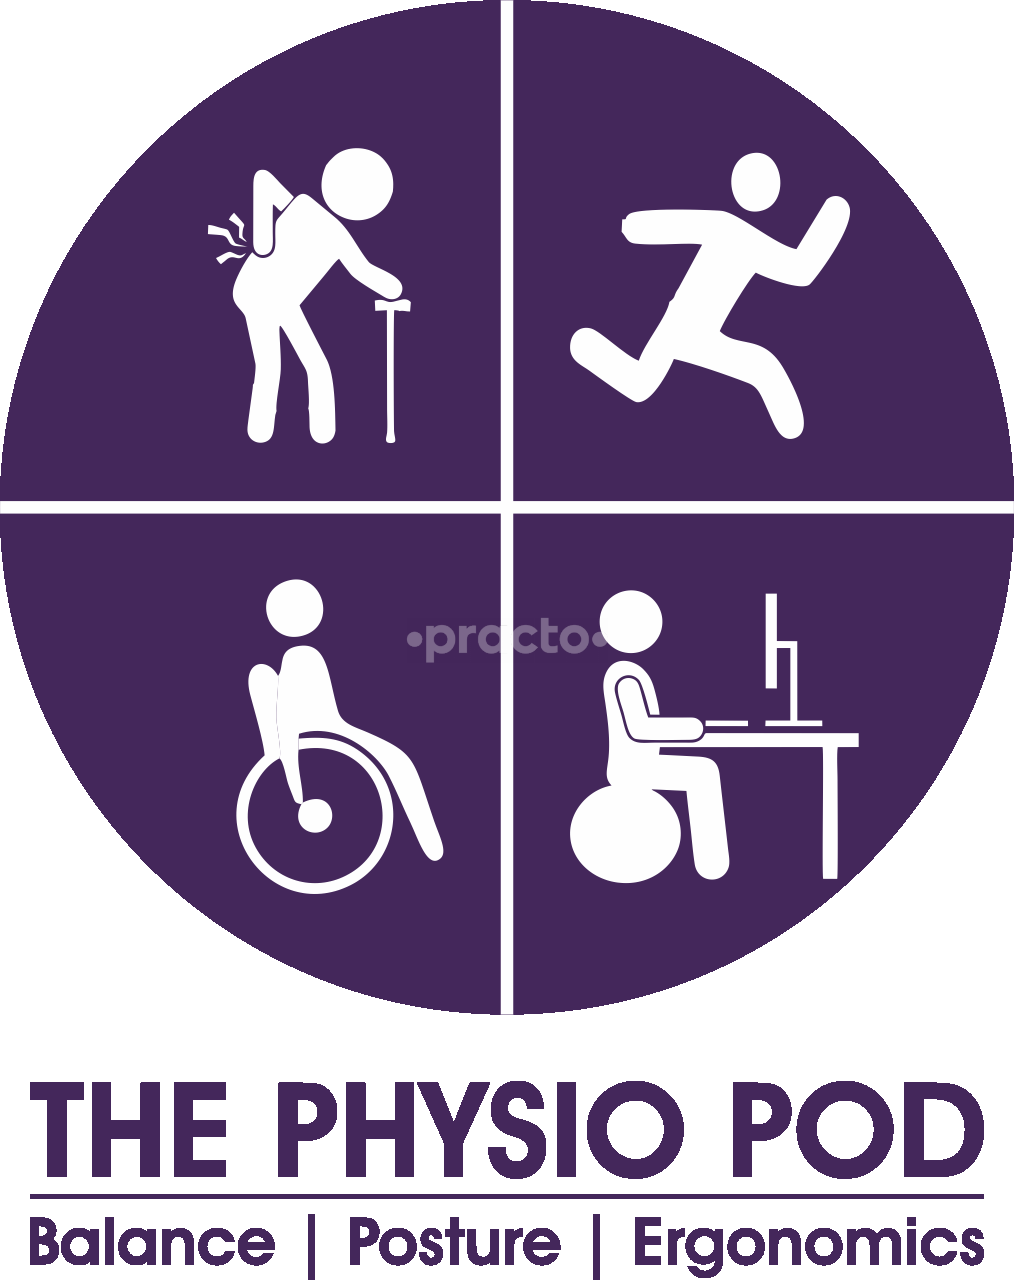 The Physio Pod